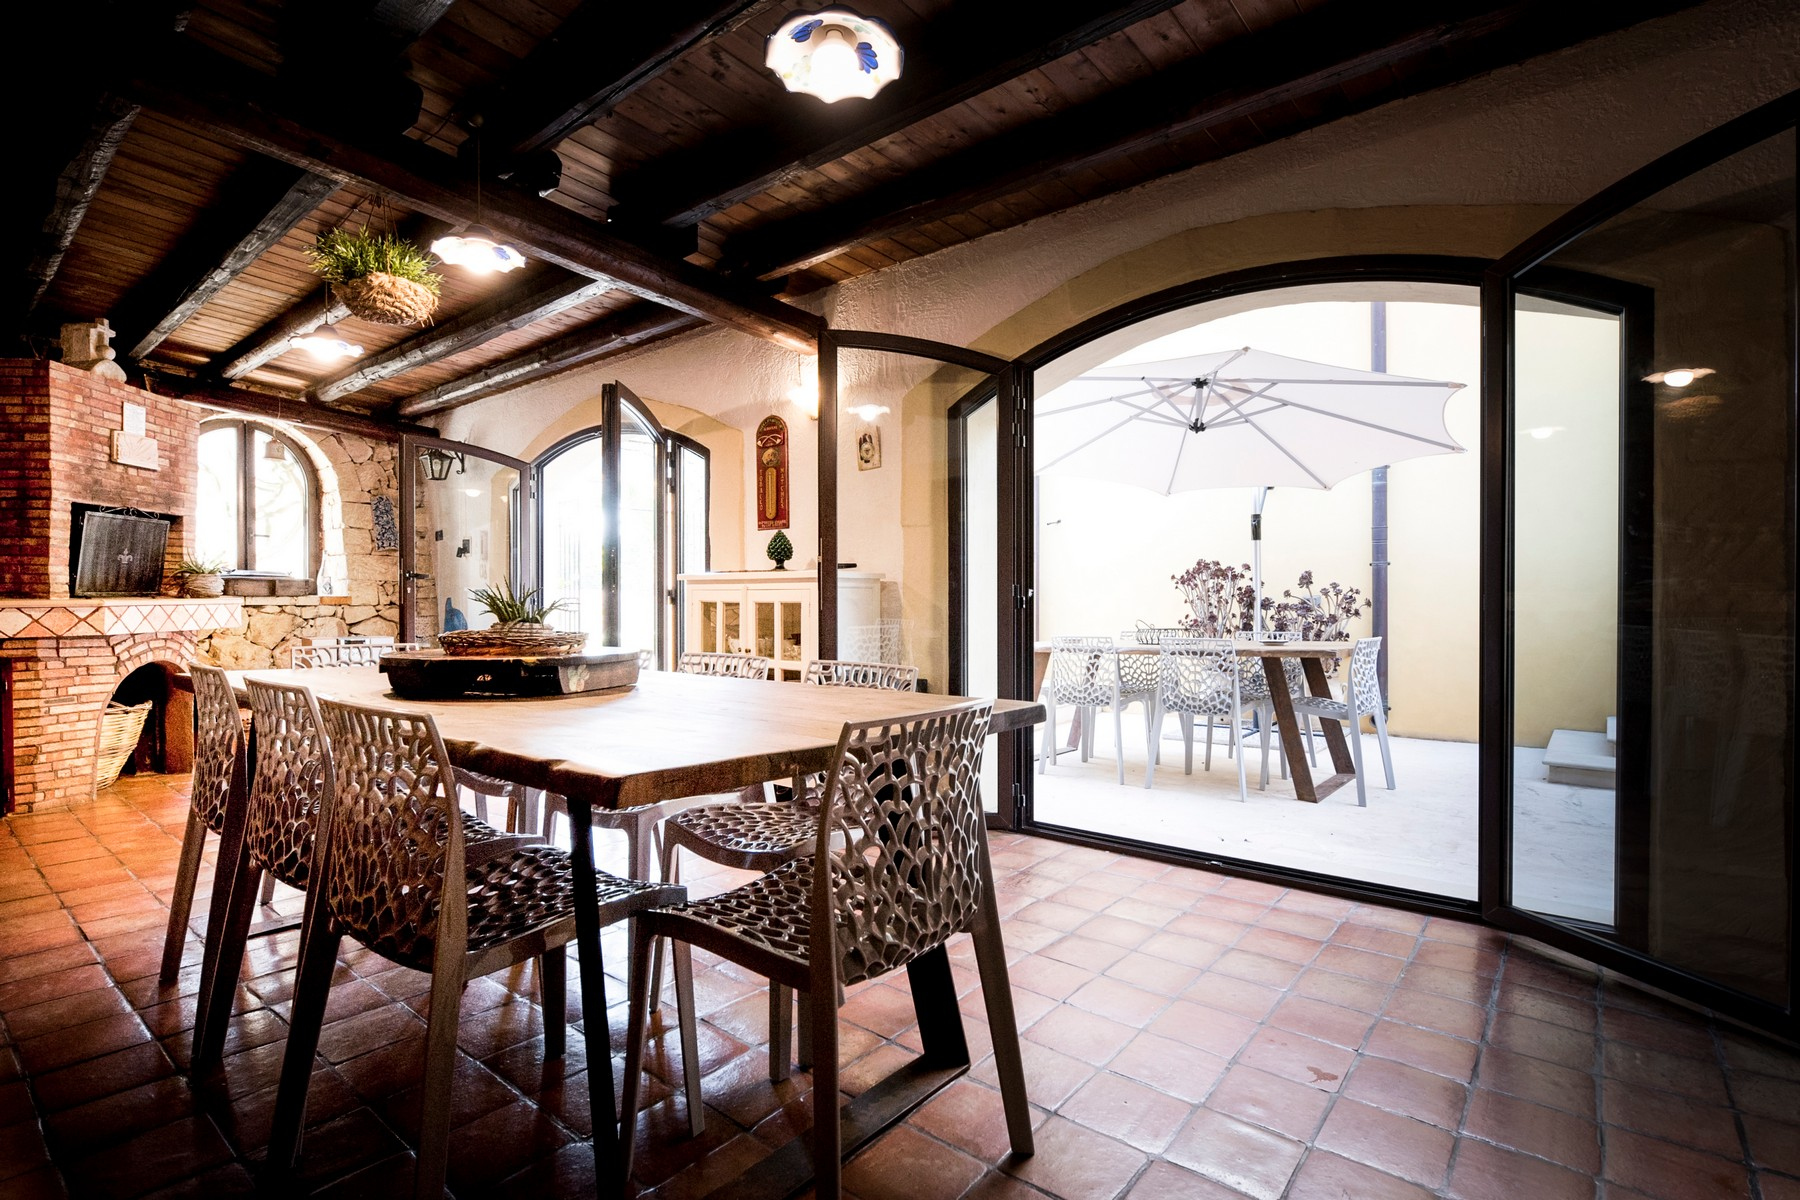 Casa indipendente in Vendita a Noto: 5 locali, 300 mq - Foto 6